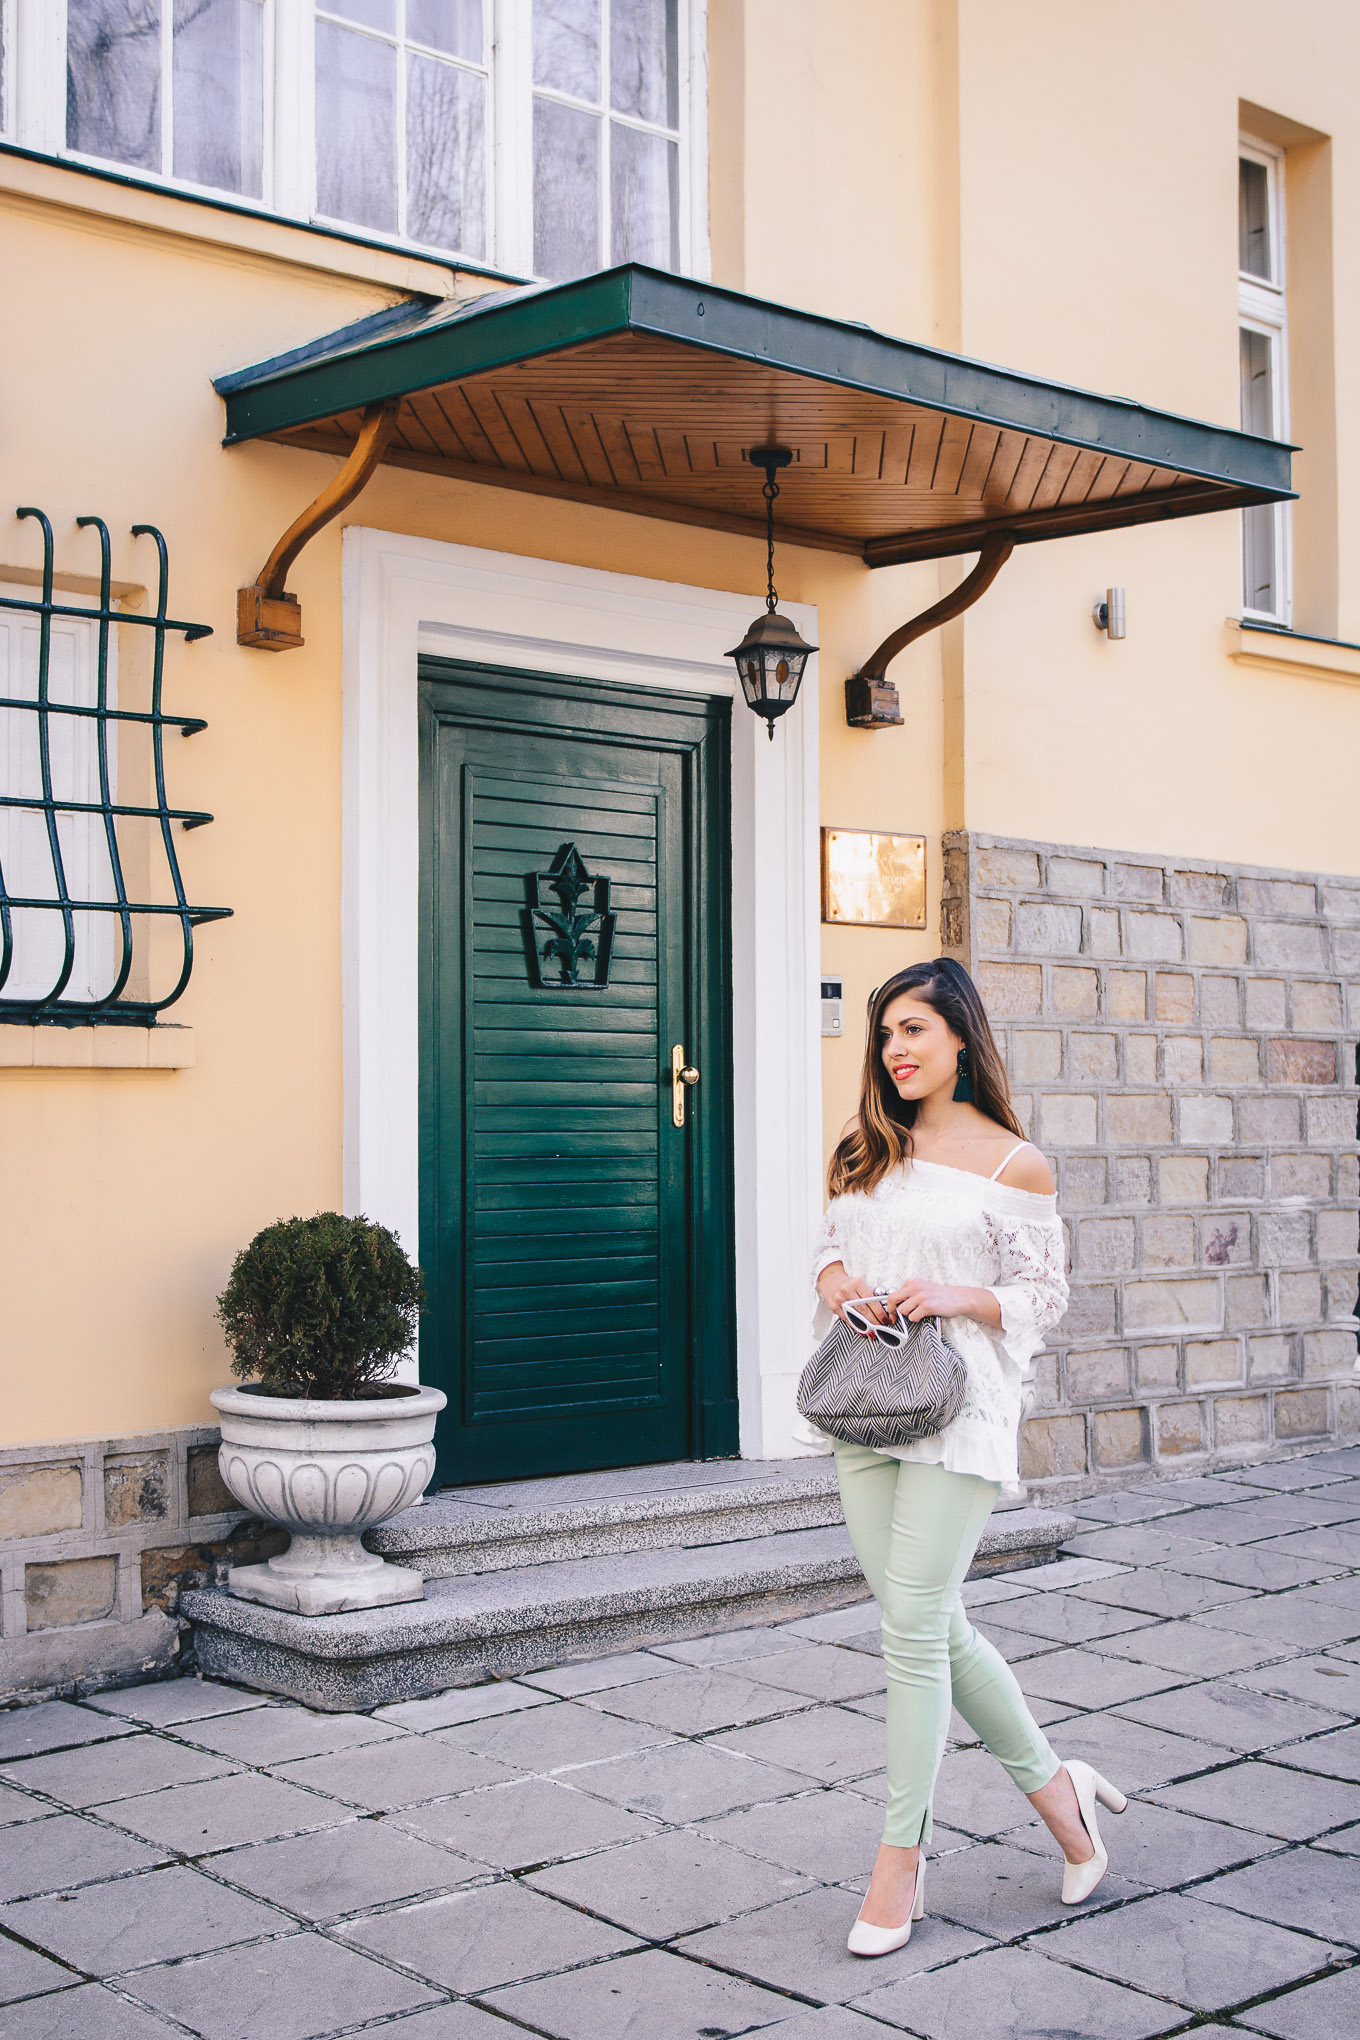 Benetton spring outfit Bulgaria mall